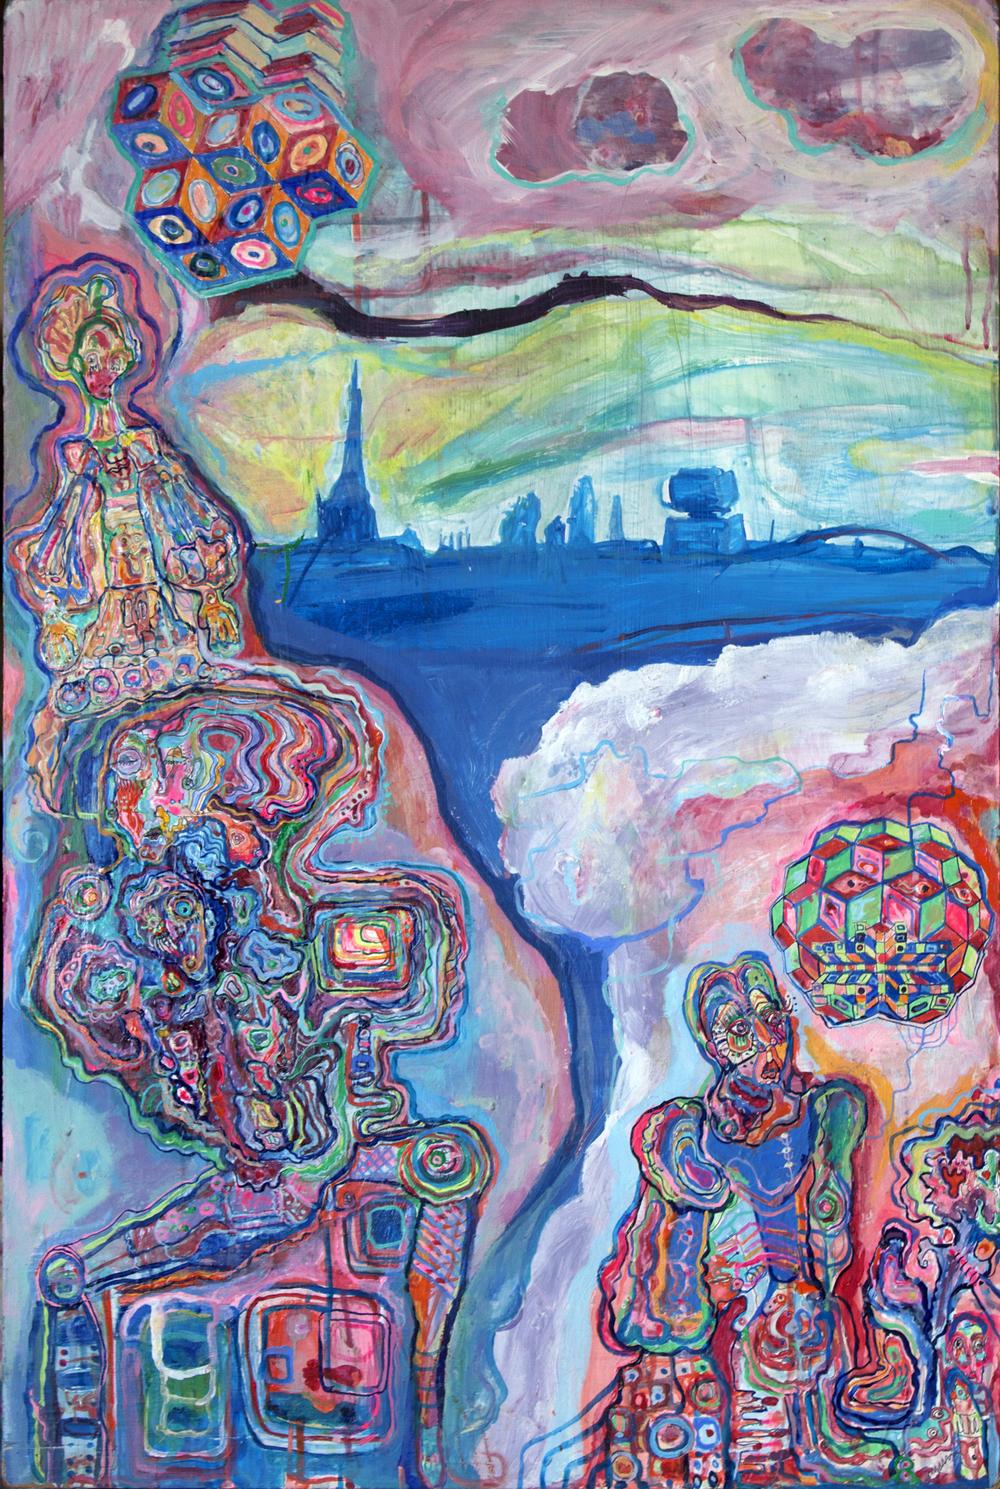 Revaler/Matkowskystrasse, mixed media, 3x2ft, 2004